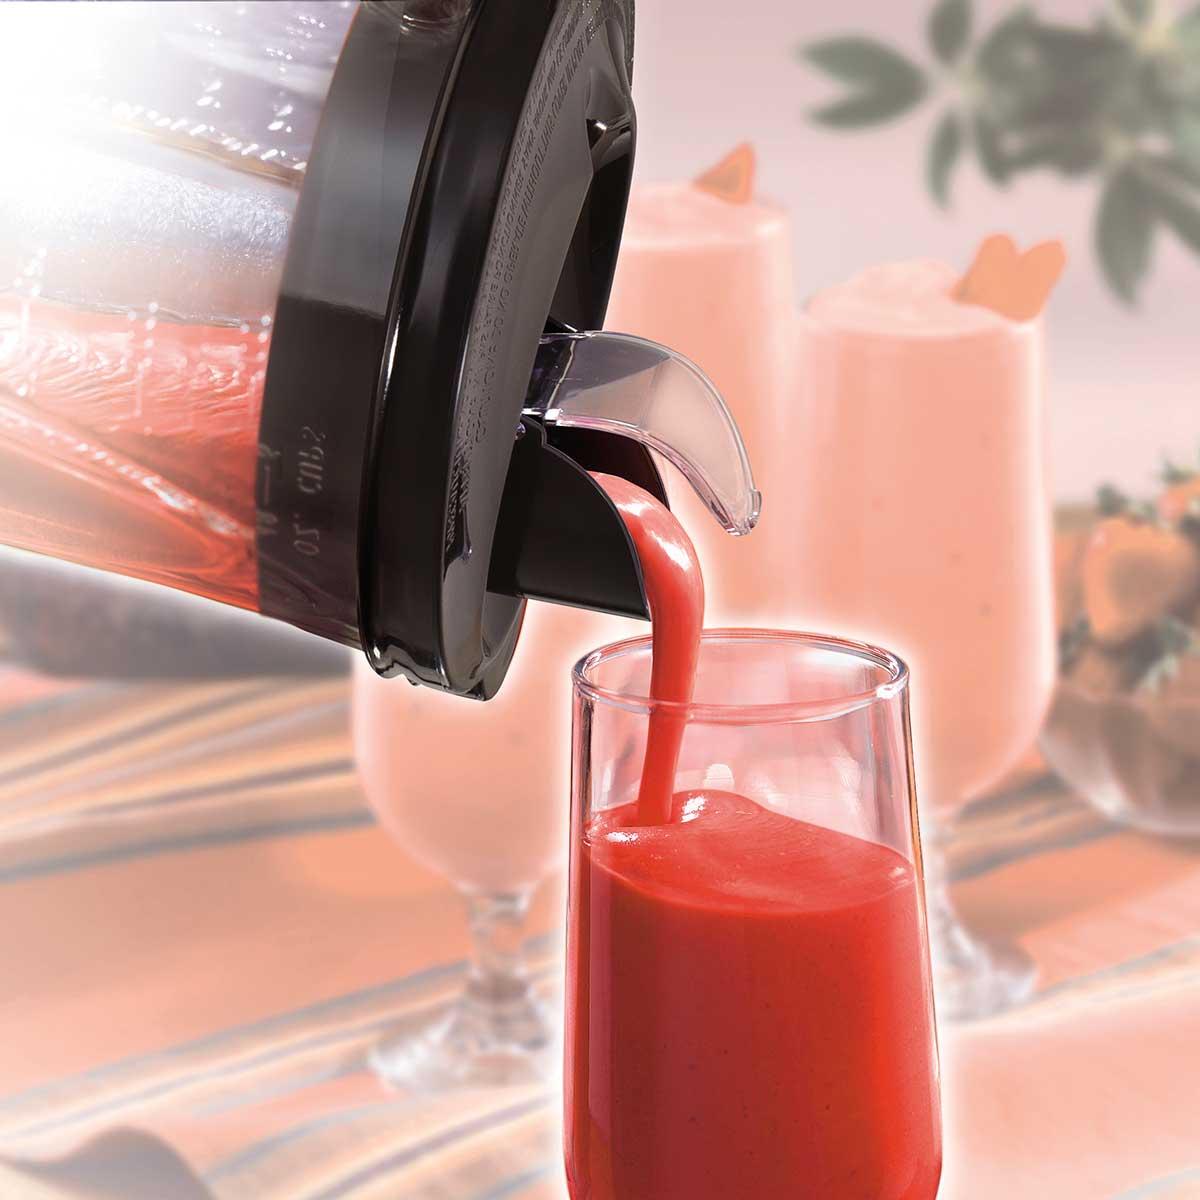 Hamilton Beach Power Elite Multi Function Blender With Mess Free 40oz Glass Jar 700w Black Stainless 58148